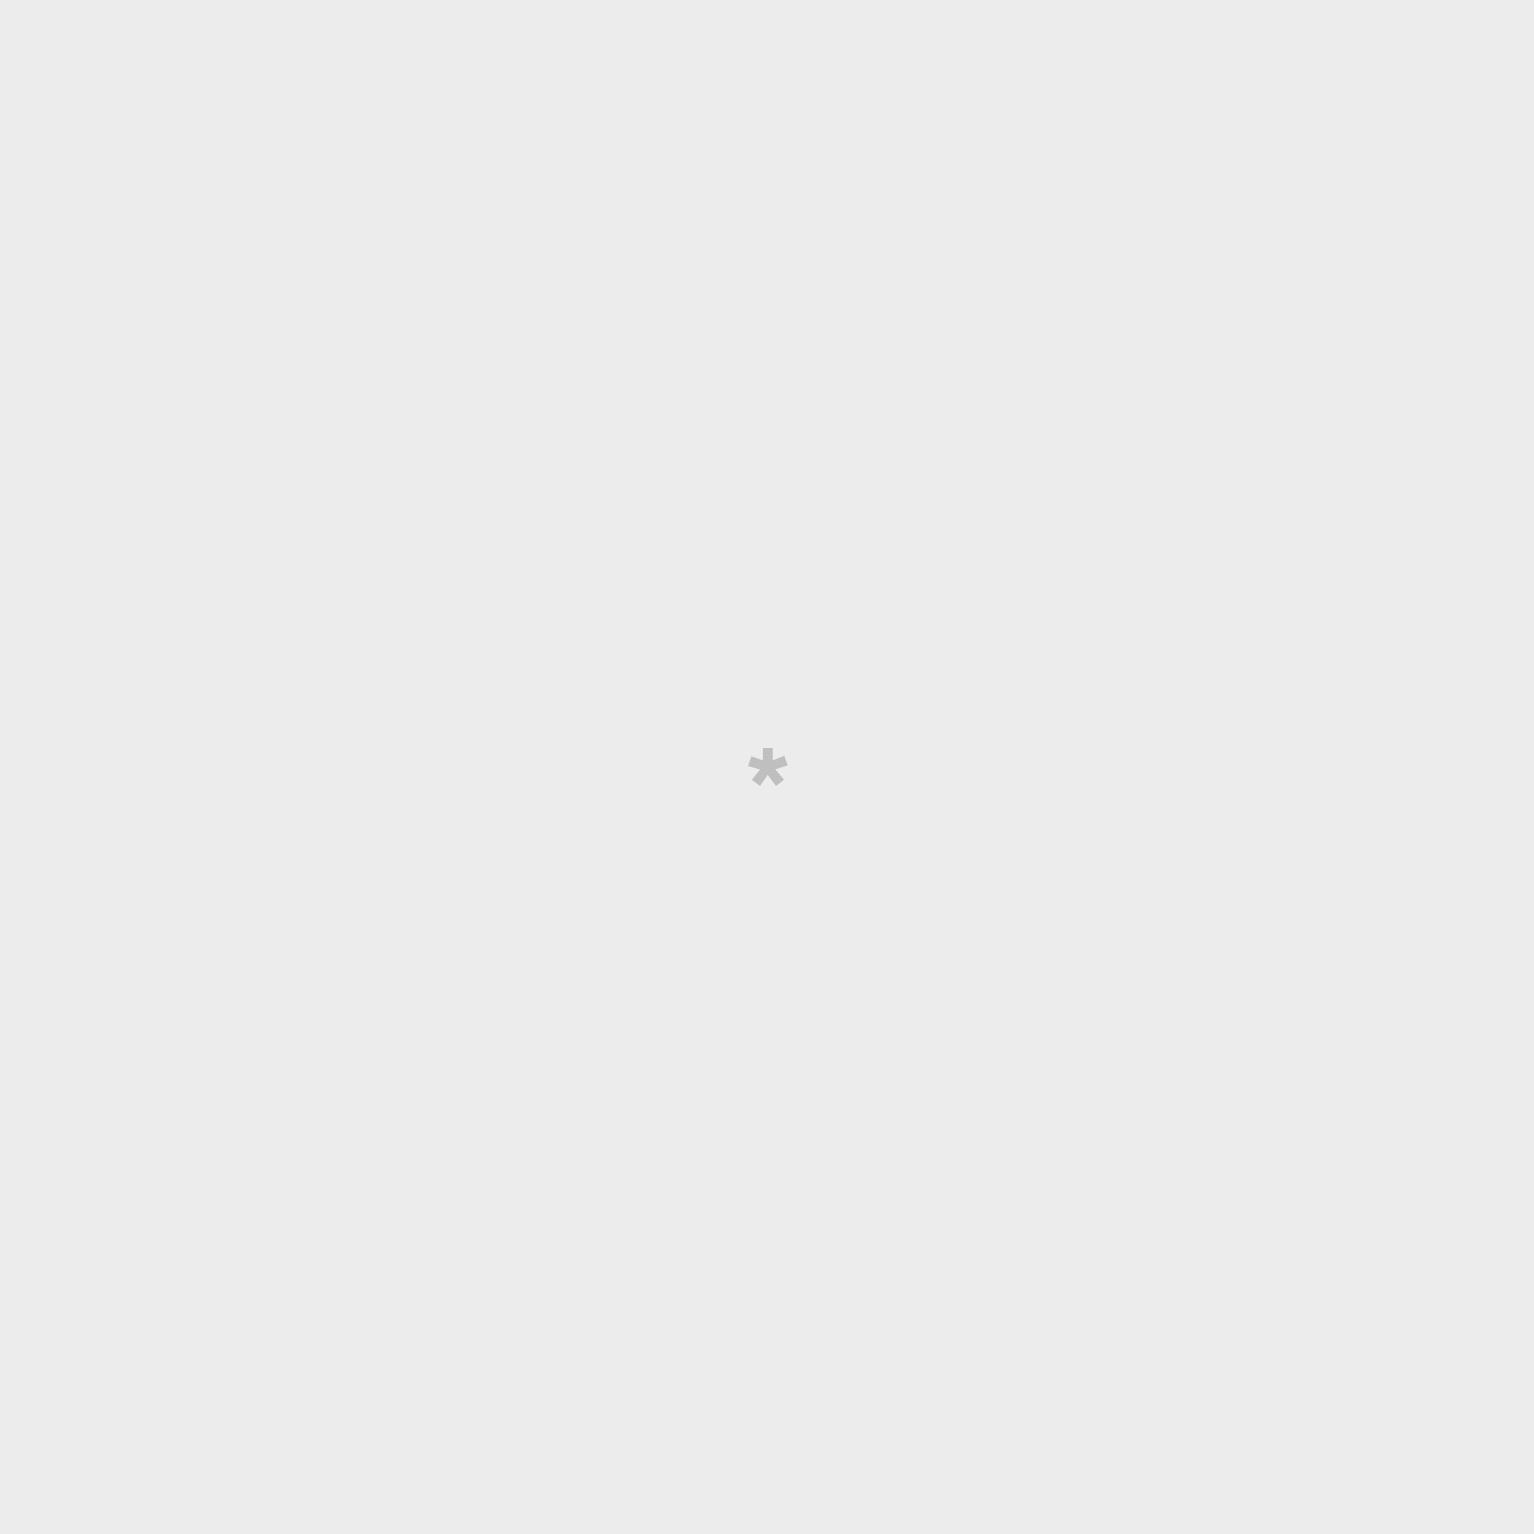 Porta-chaves - I like myself